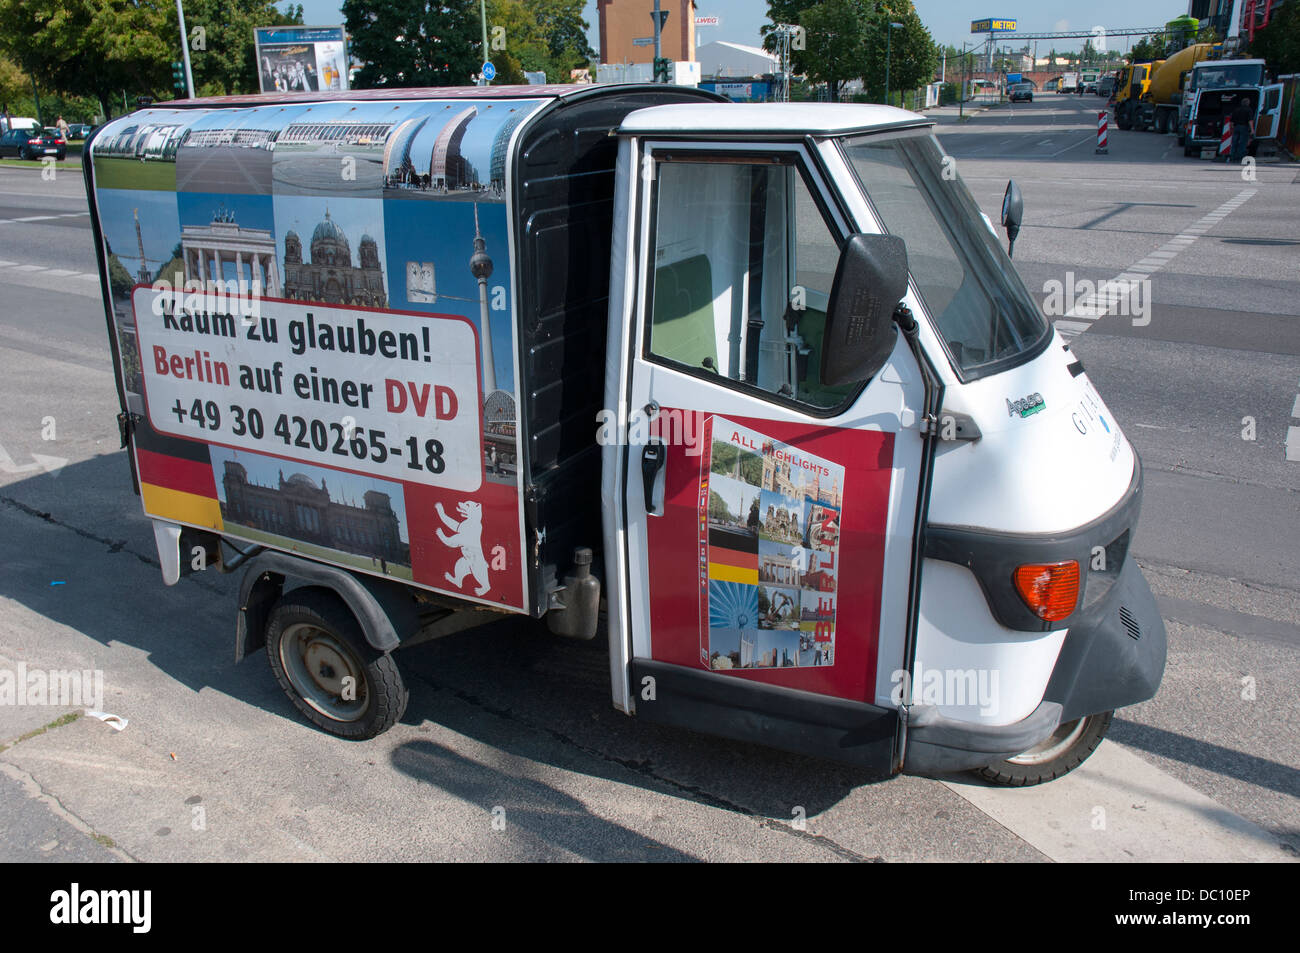 Tiny Truck Germany Berlin Friedrichshain Kreuzberg Tiny Truck Advertising